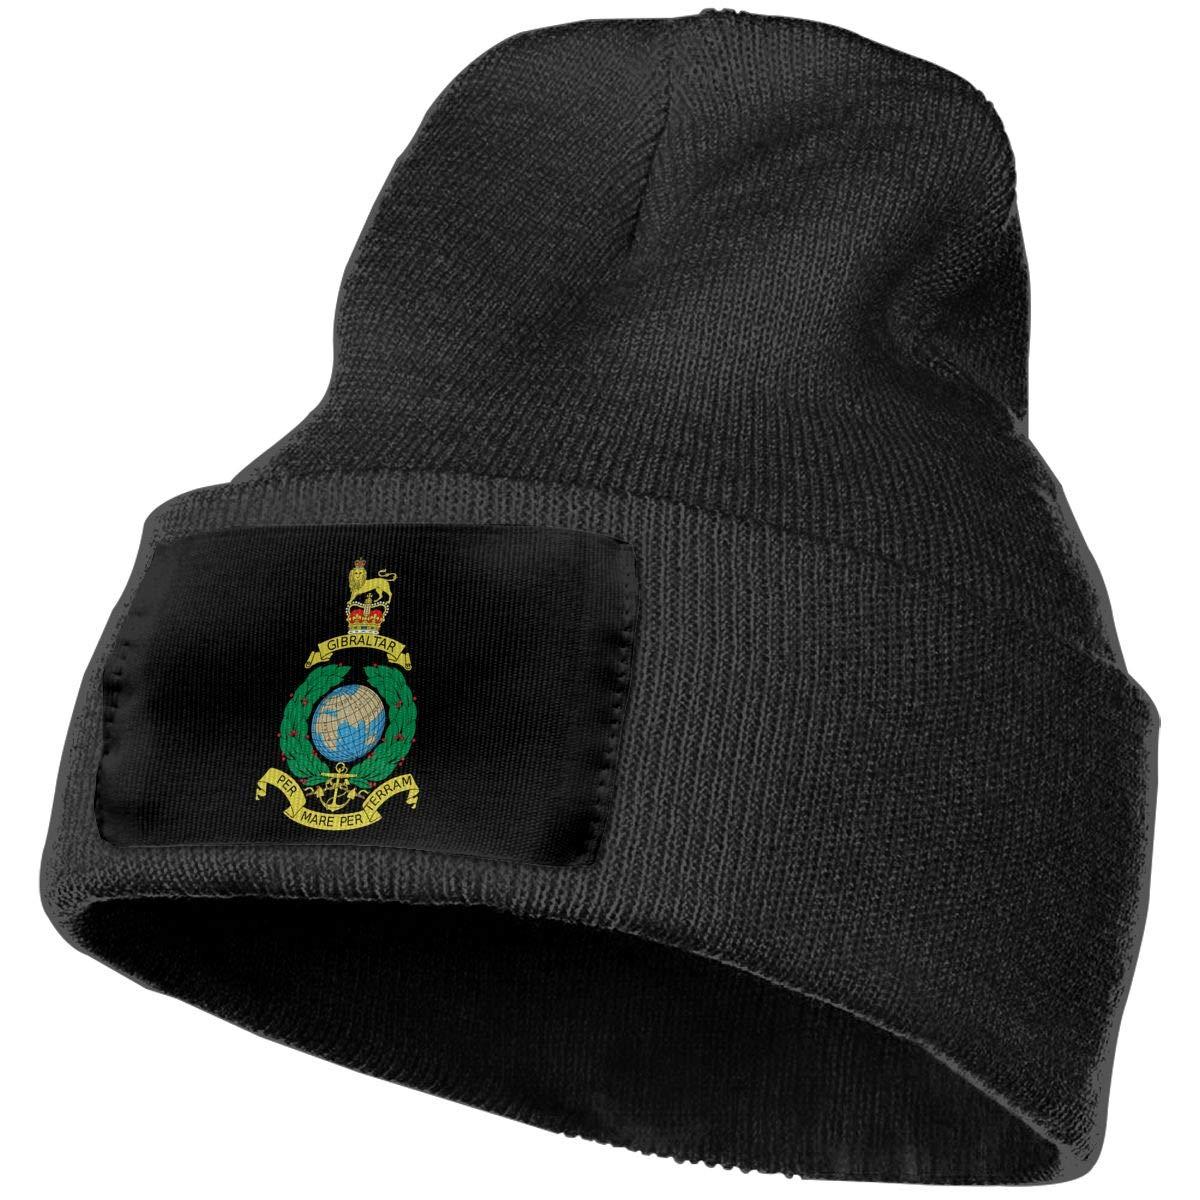 Unisex 3D Knitted Hat Skull Hat Beanie Cap Royal Marines